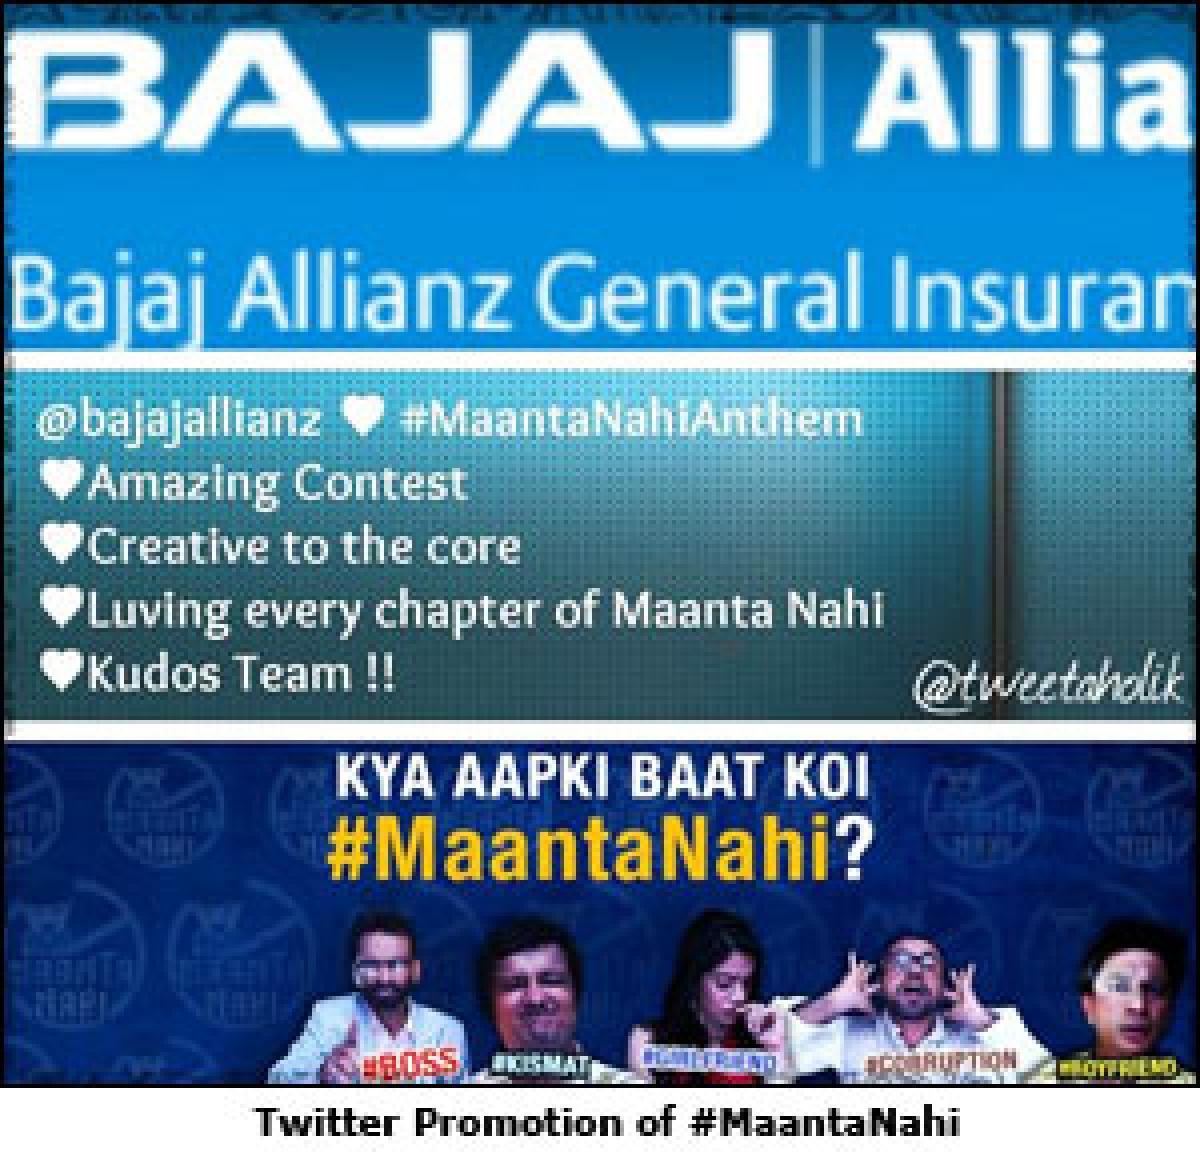 Bajaj Allianz: The Trouble-free Mantra